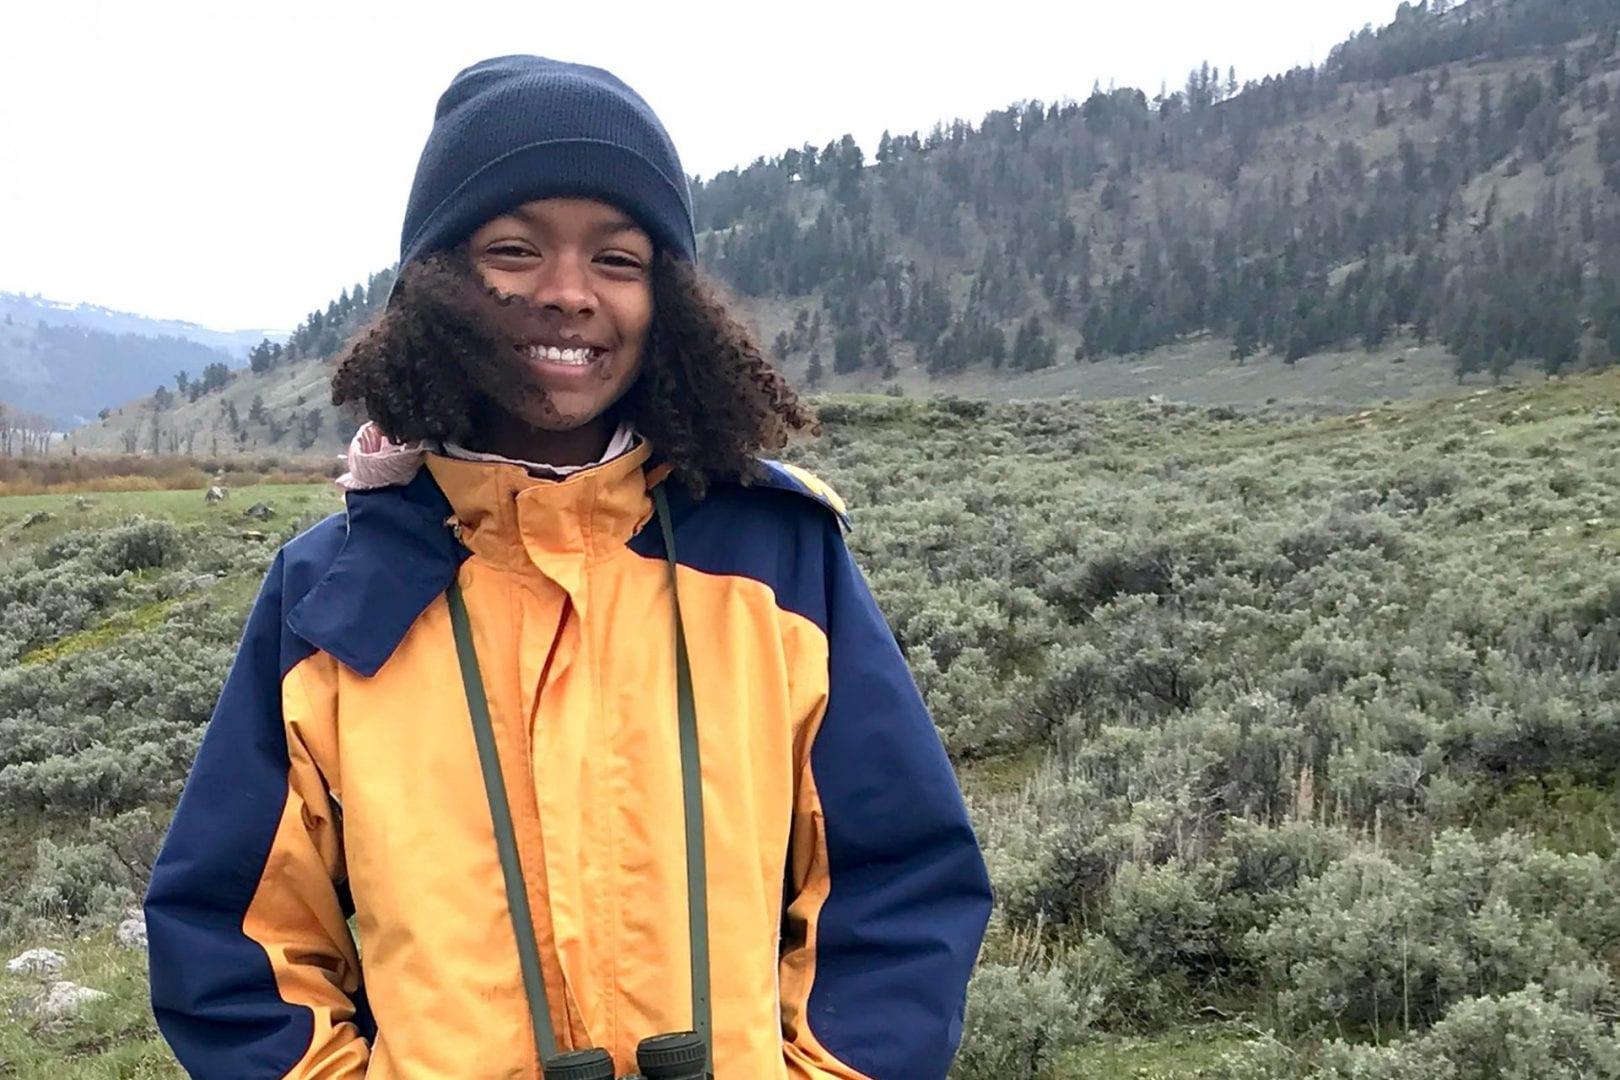 Student wearing binoculars in wilderness setting